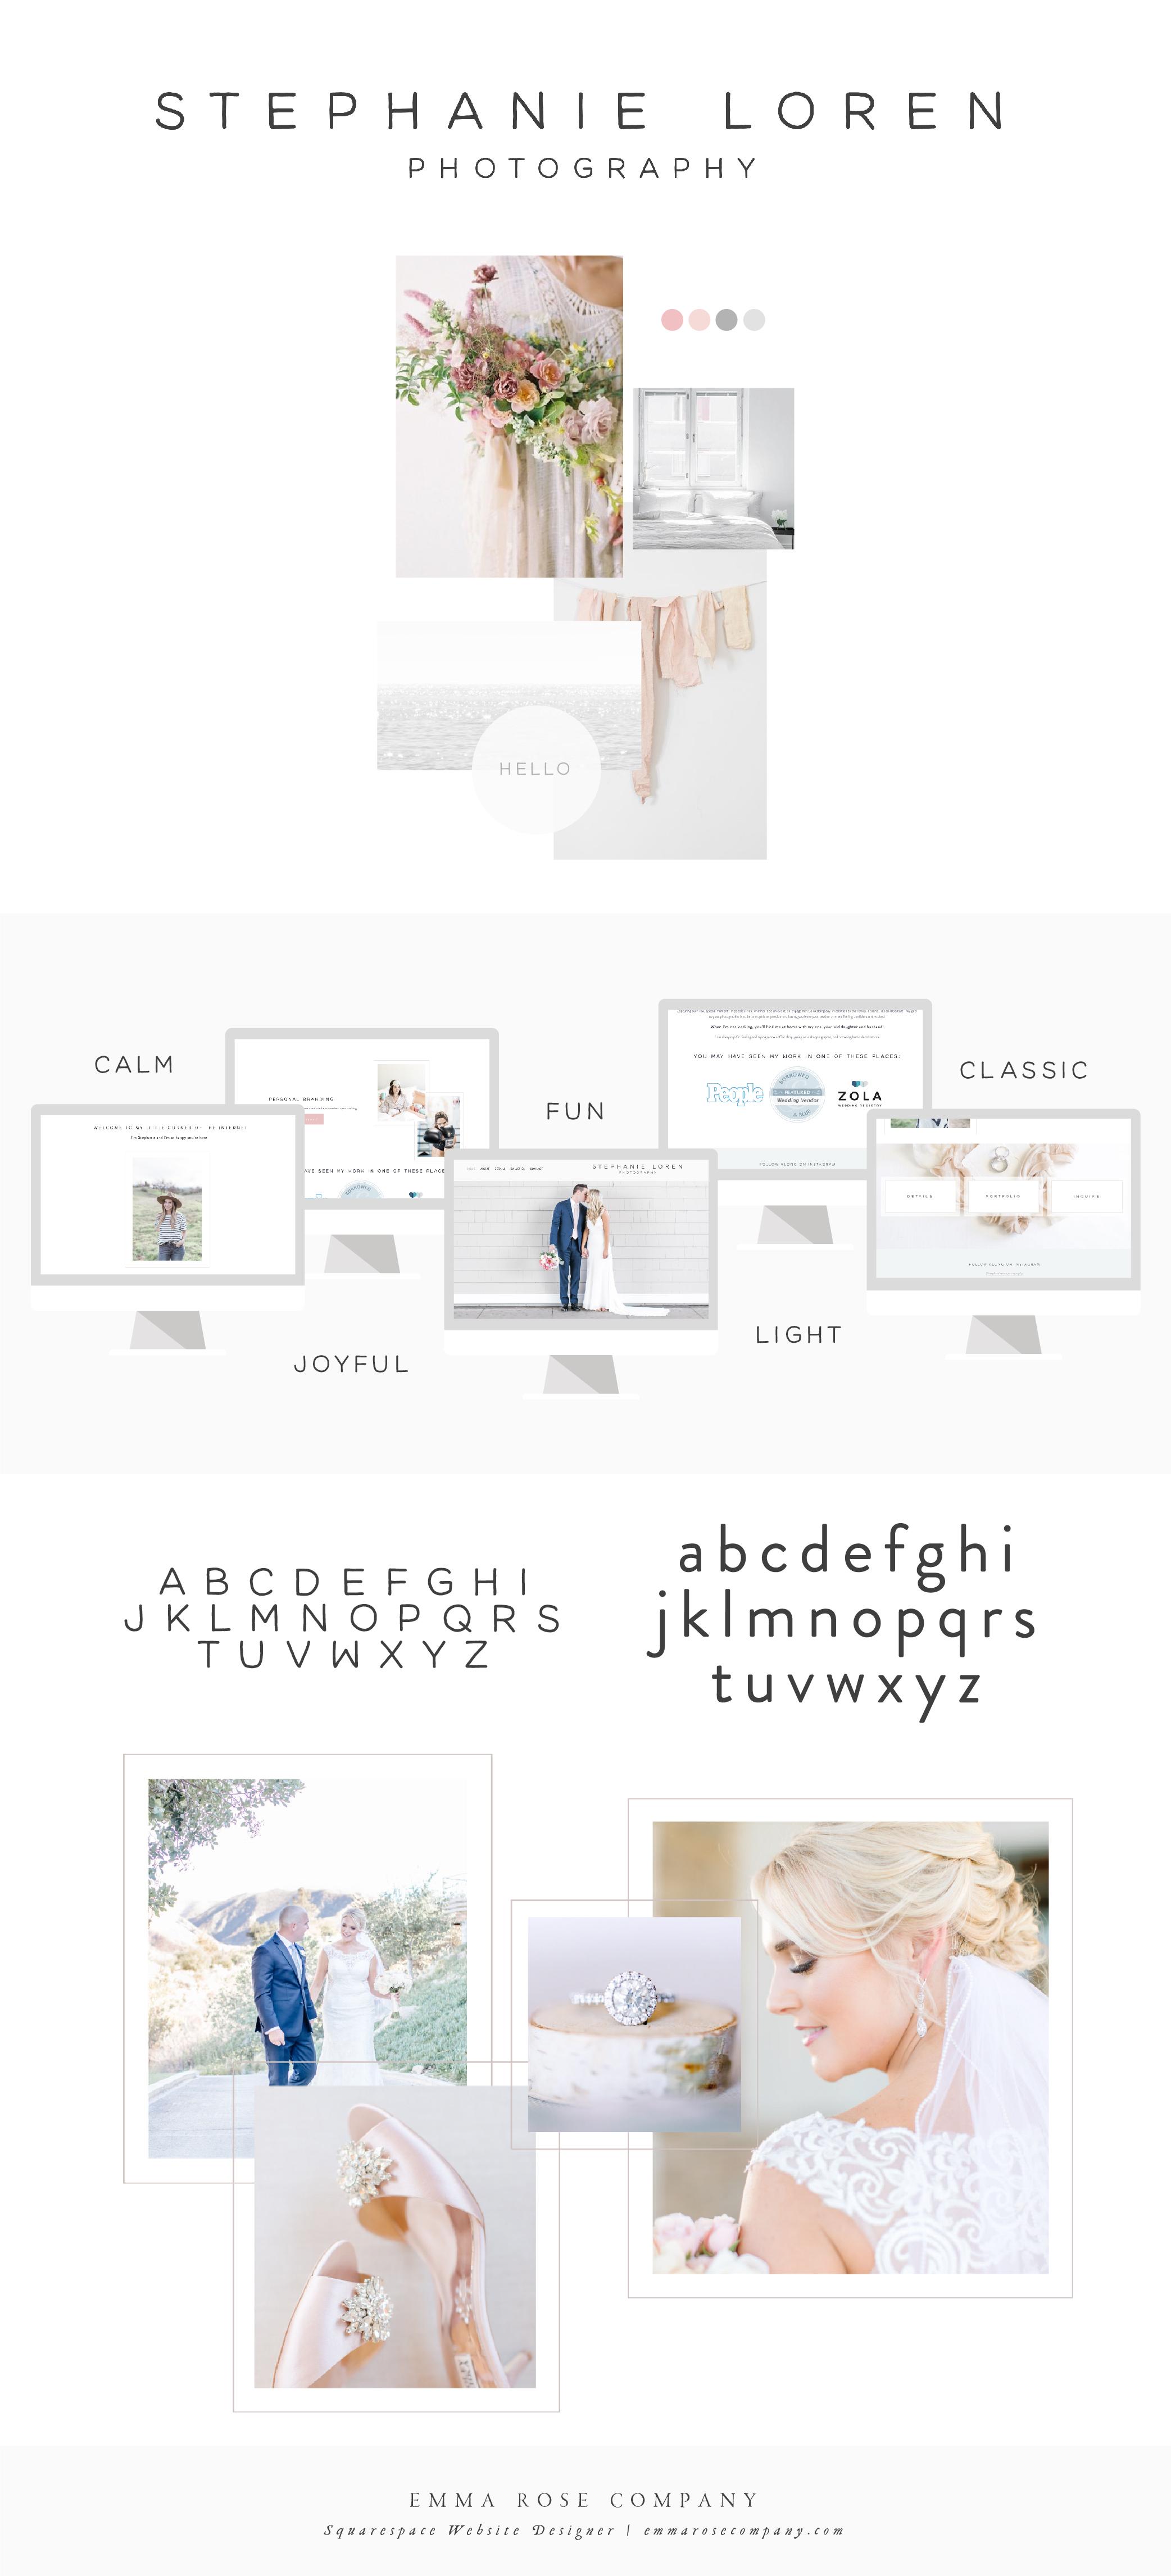 Stephanie Loren Project Showcase_Brand Board-01.jpg